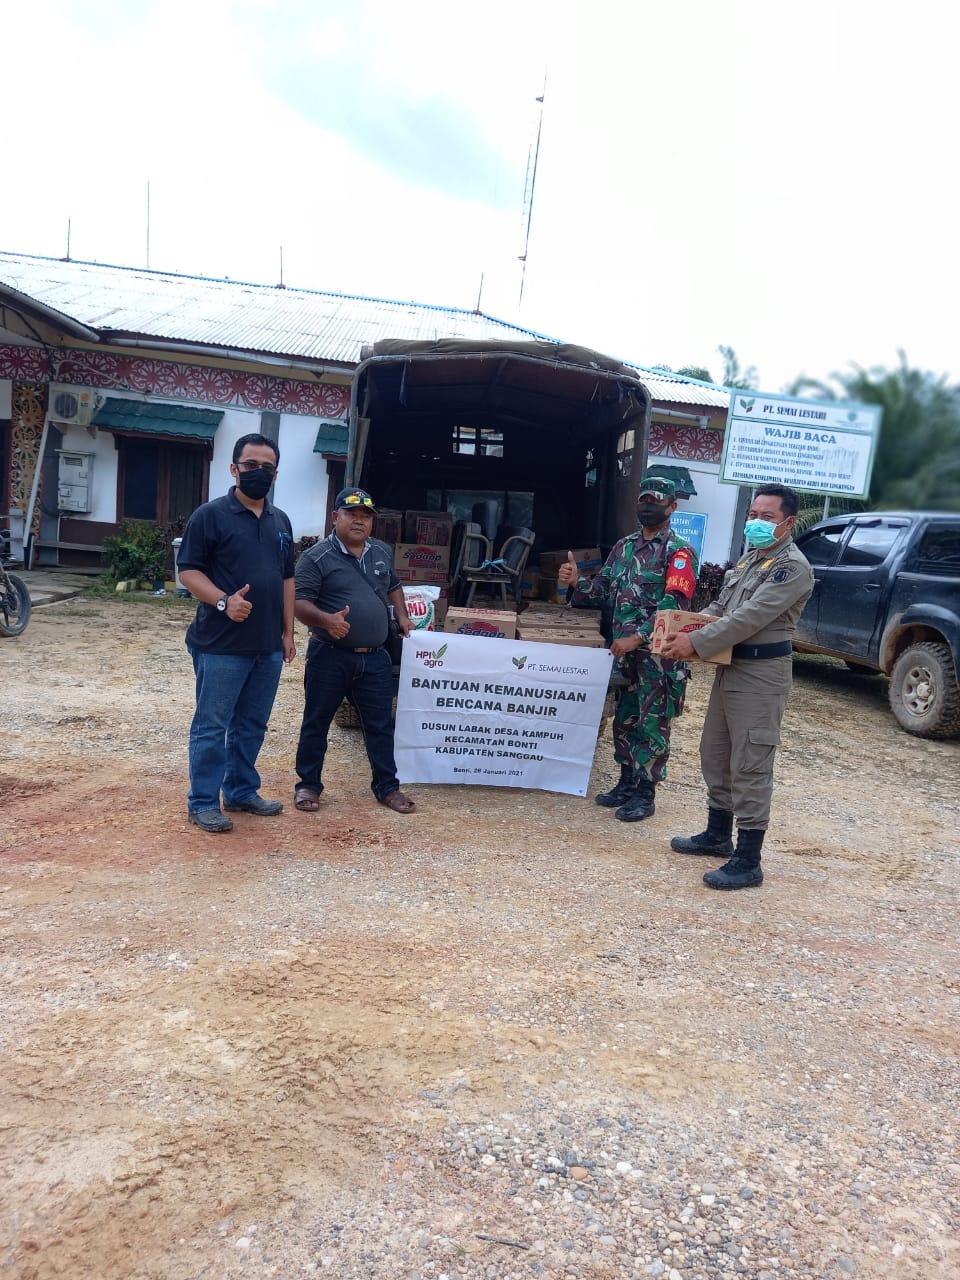 HPI Agro PT.Semai Lestari Serahkan Bantuan Sembako Di Dusun Labak Desa Kampuh Kecamatan Bonti